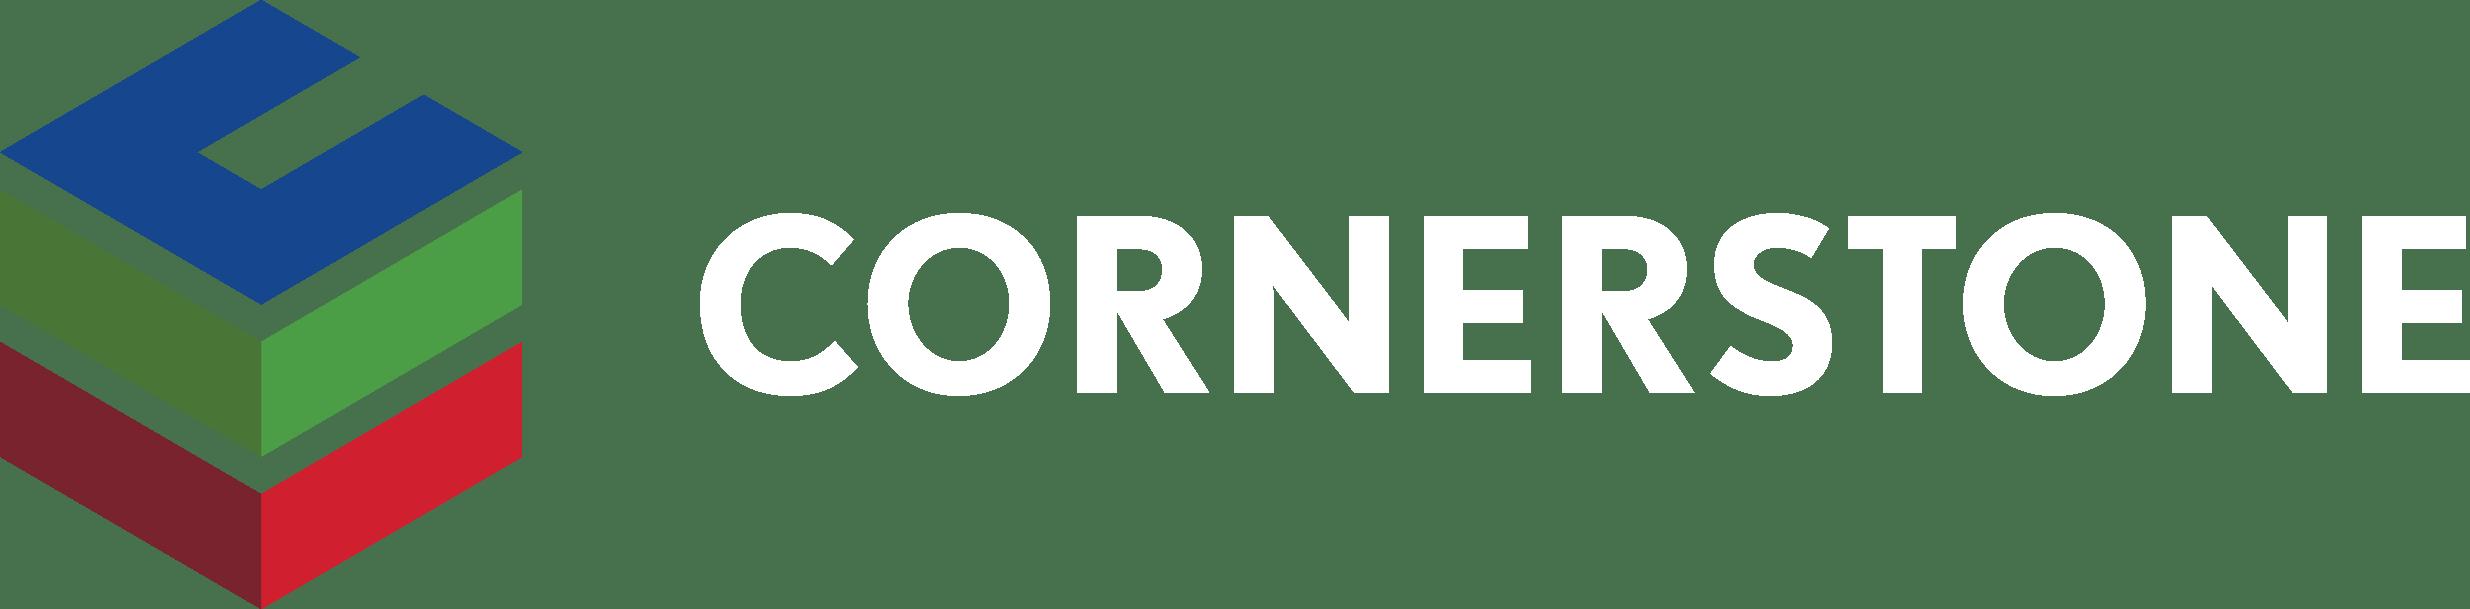 2.+Logo+-+Cornerstone+-+Horizontal+Reversed